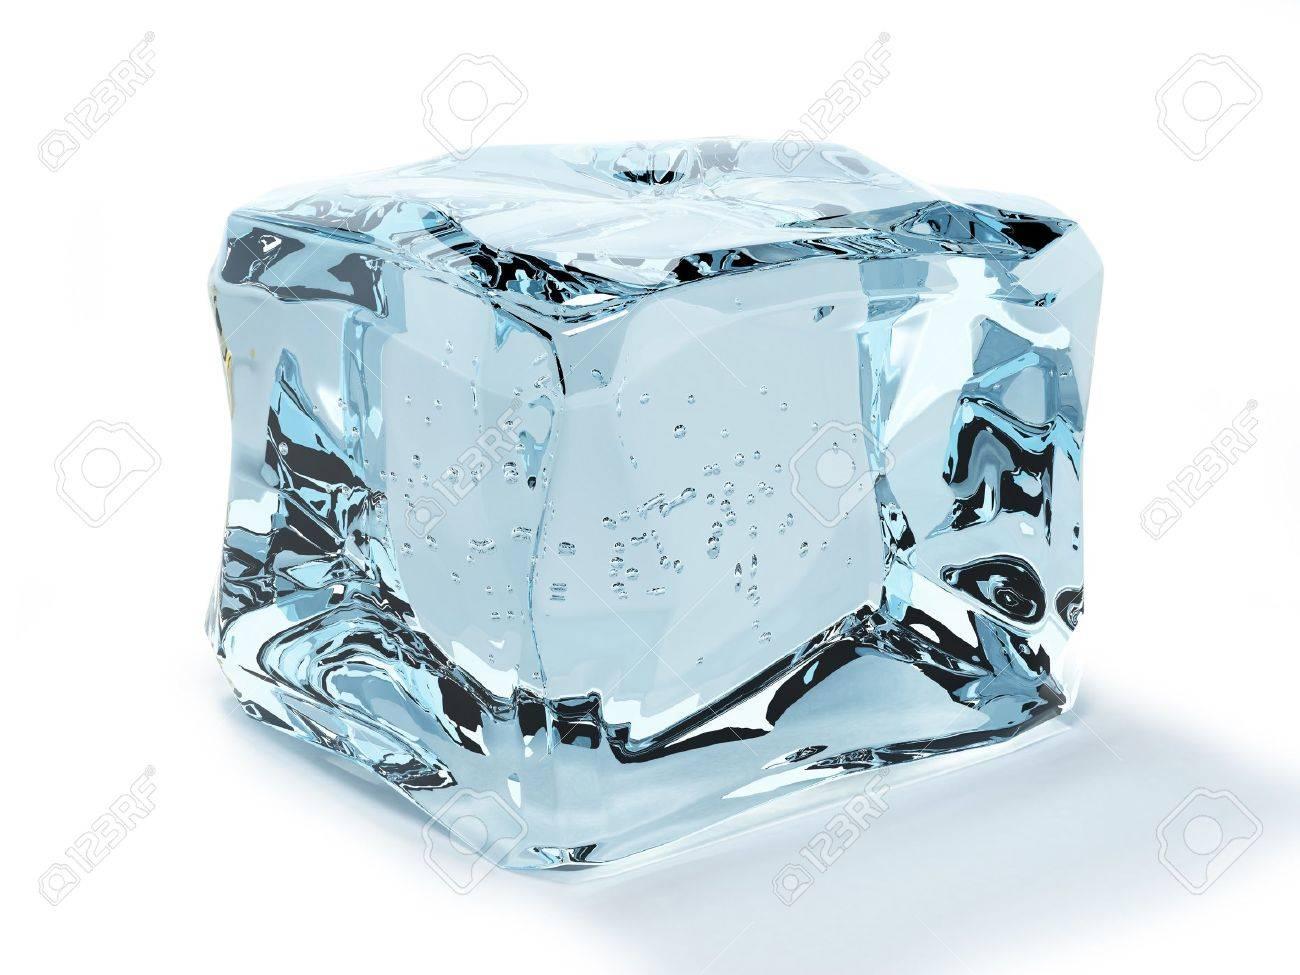 4476358-ice-cube-isolated-on-white-backg